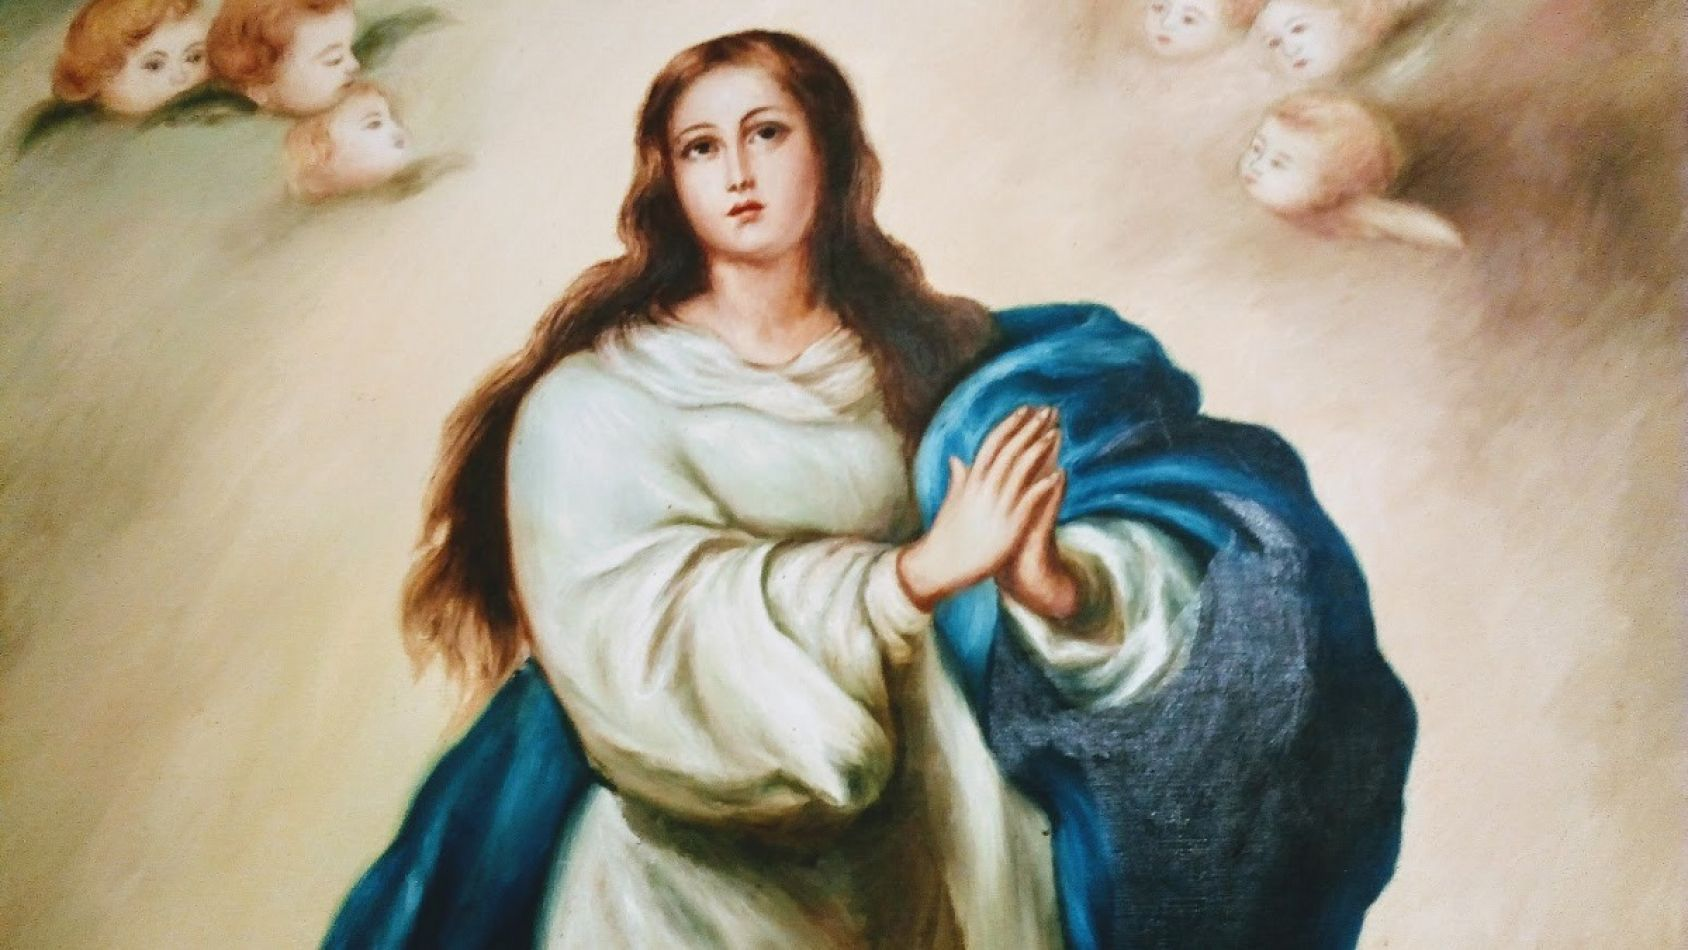 Se realizará la celebración de la Virgen de Urkupiña